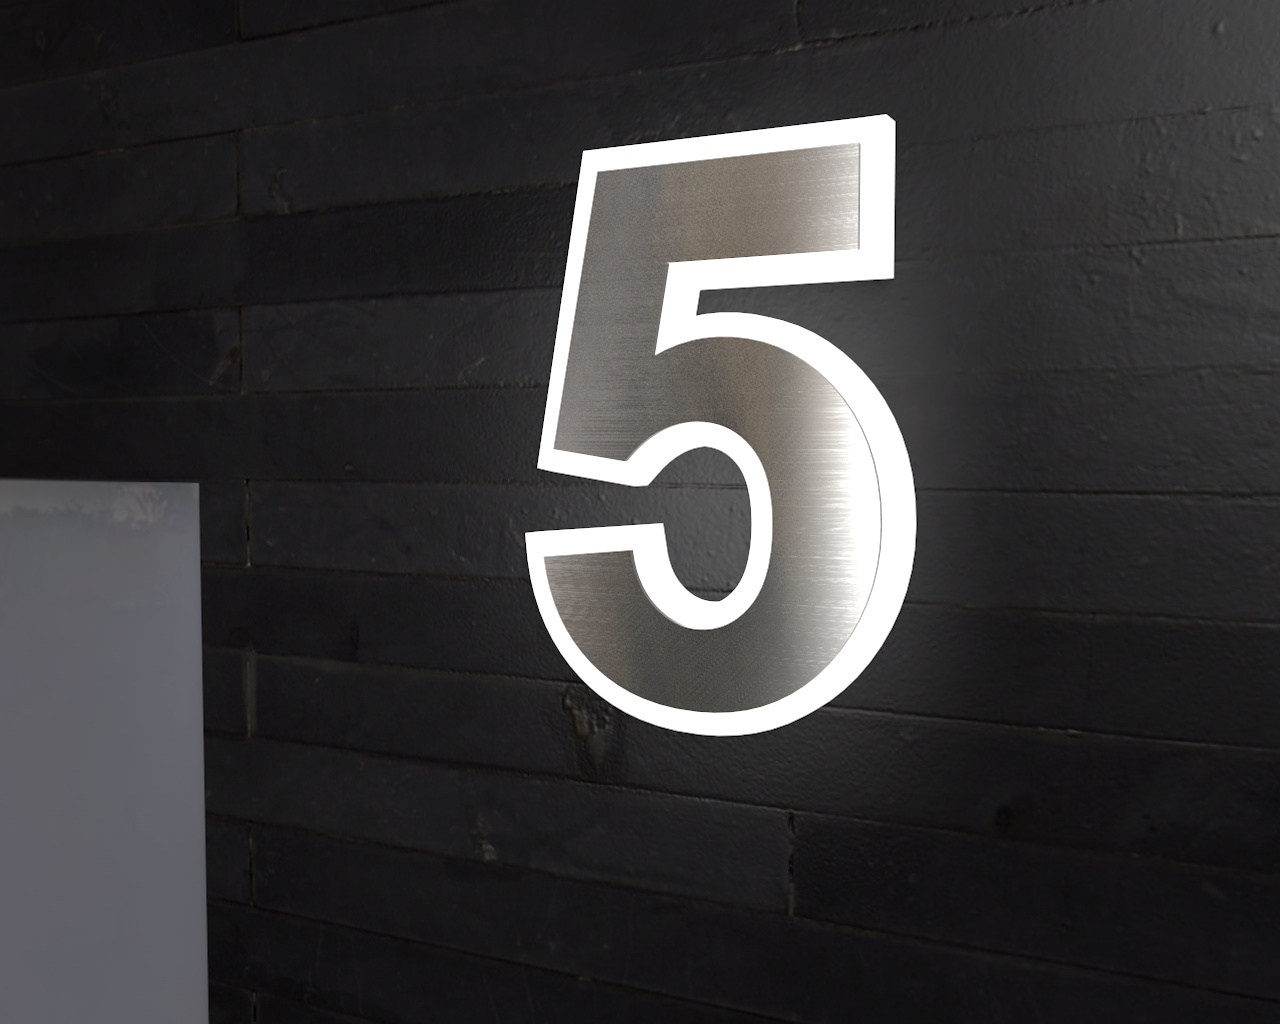 Beleuchtete Hausnummer 8 Ambilight